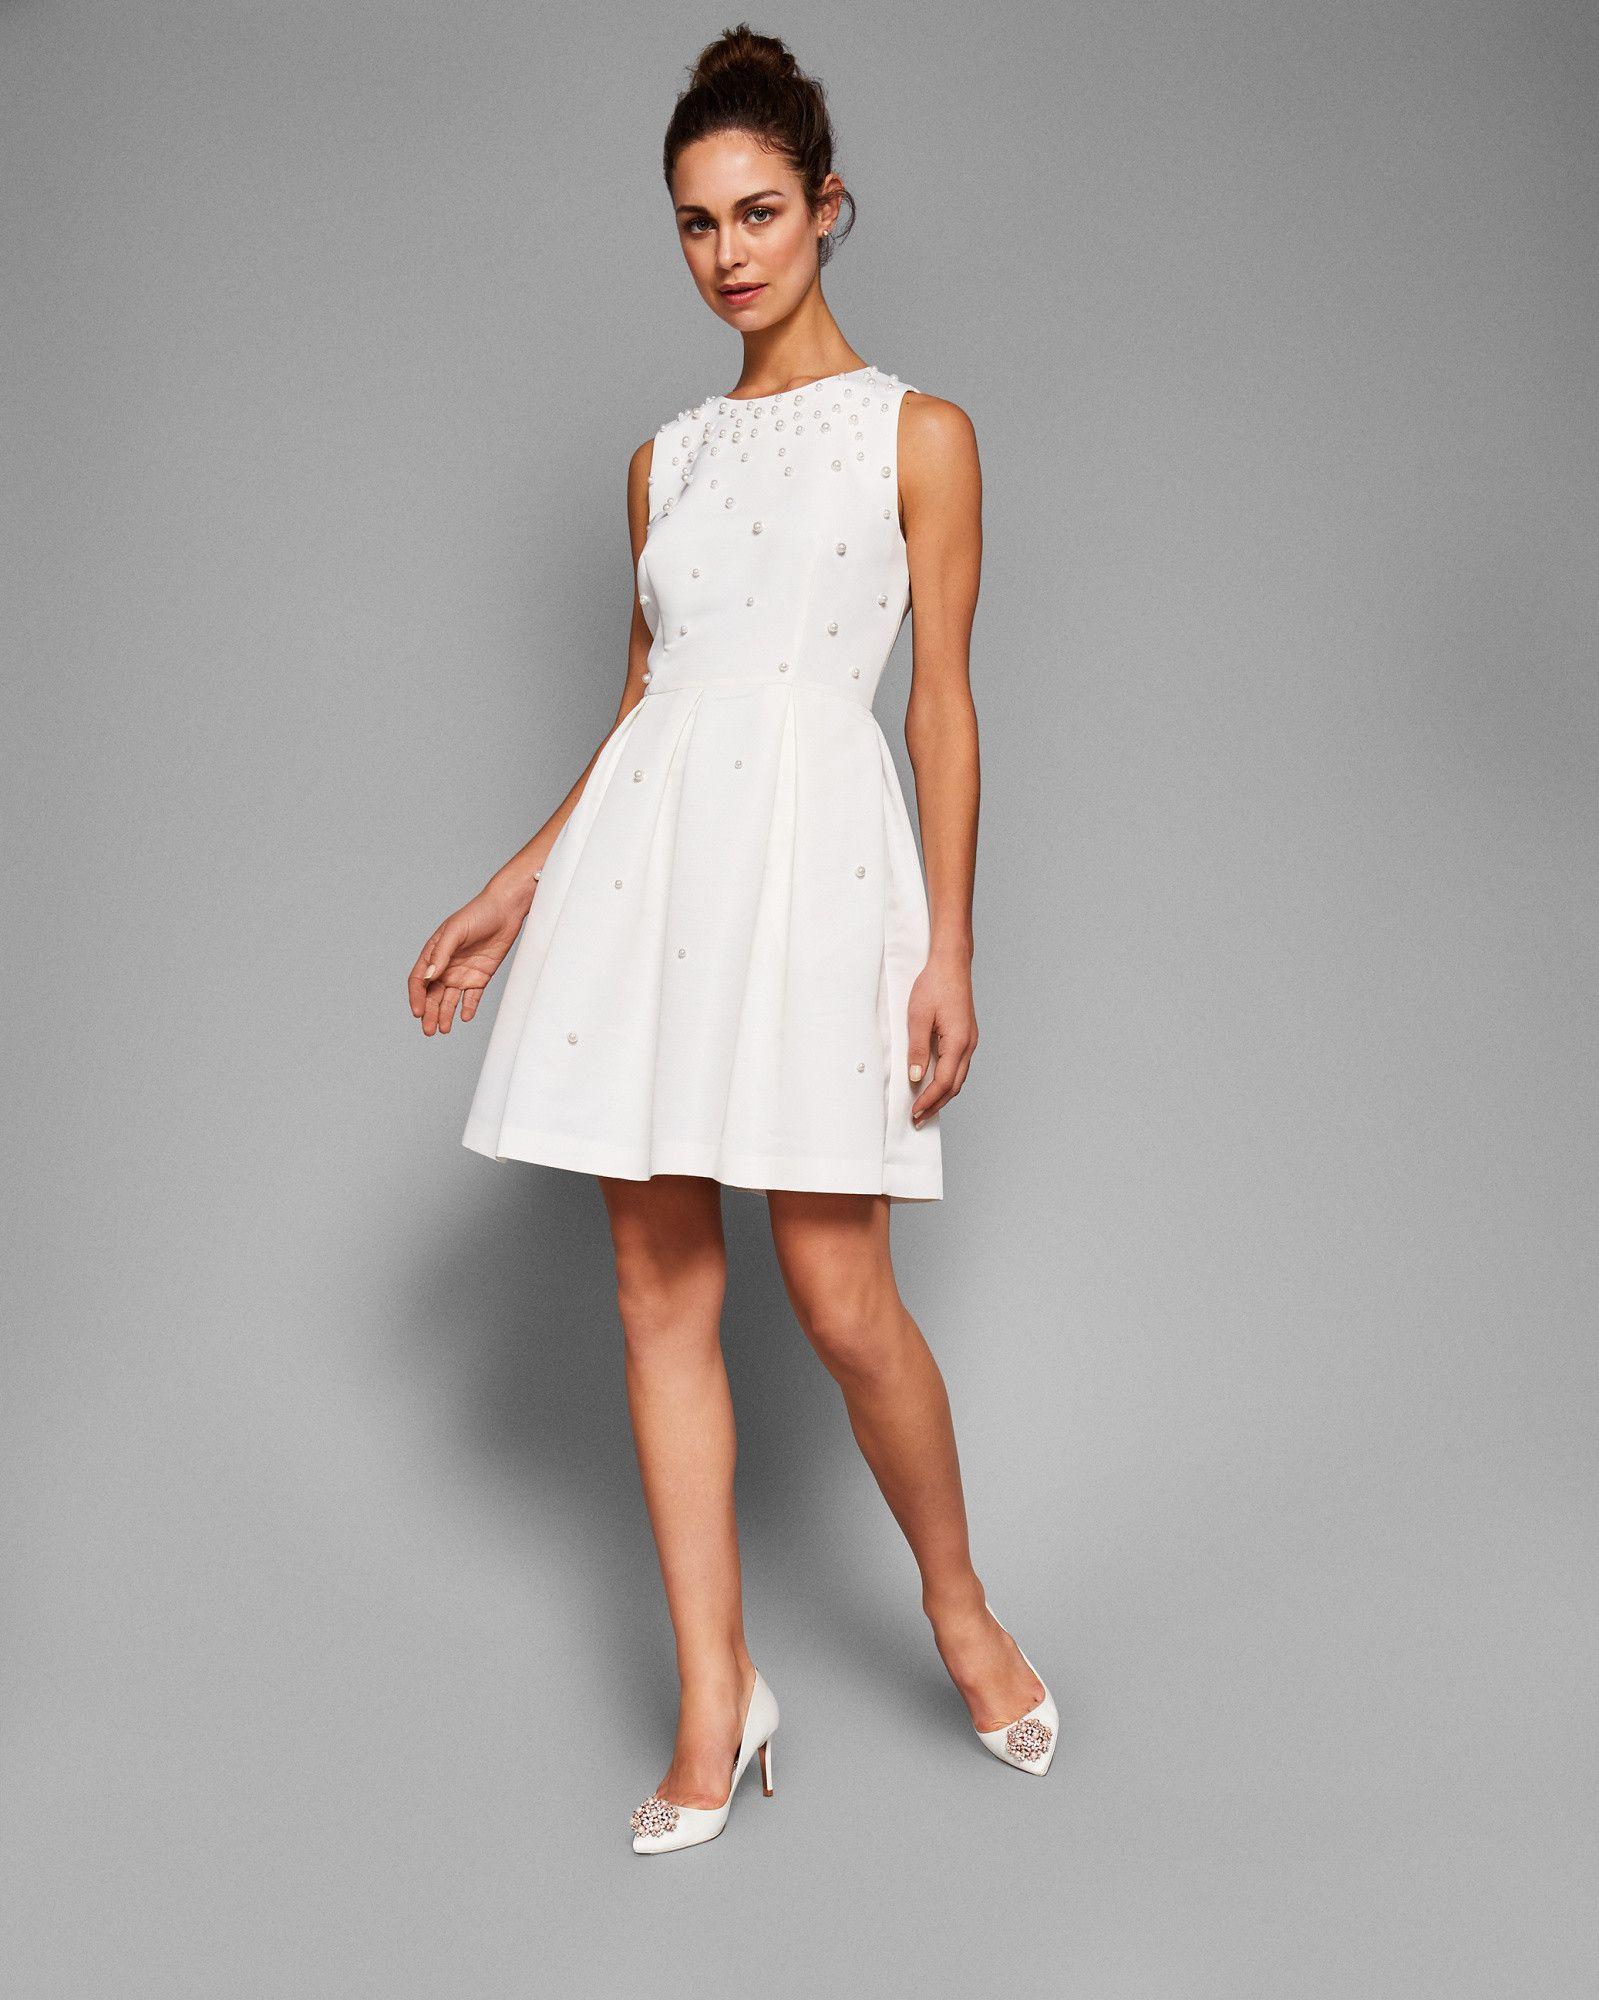 8b252c6c3c6 MILLIEA Pearl embellished skater dress  TedToToe